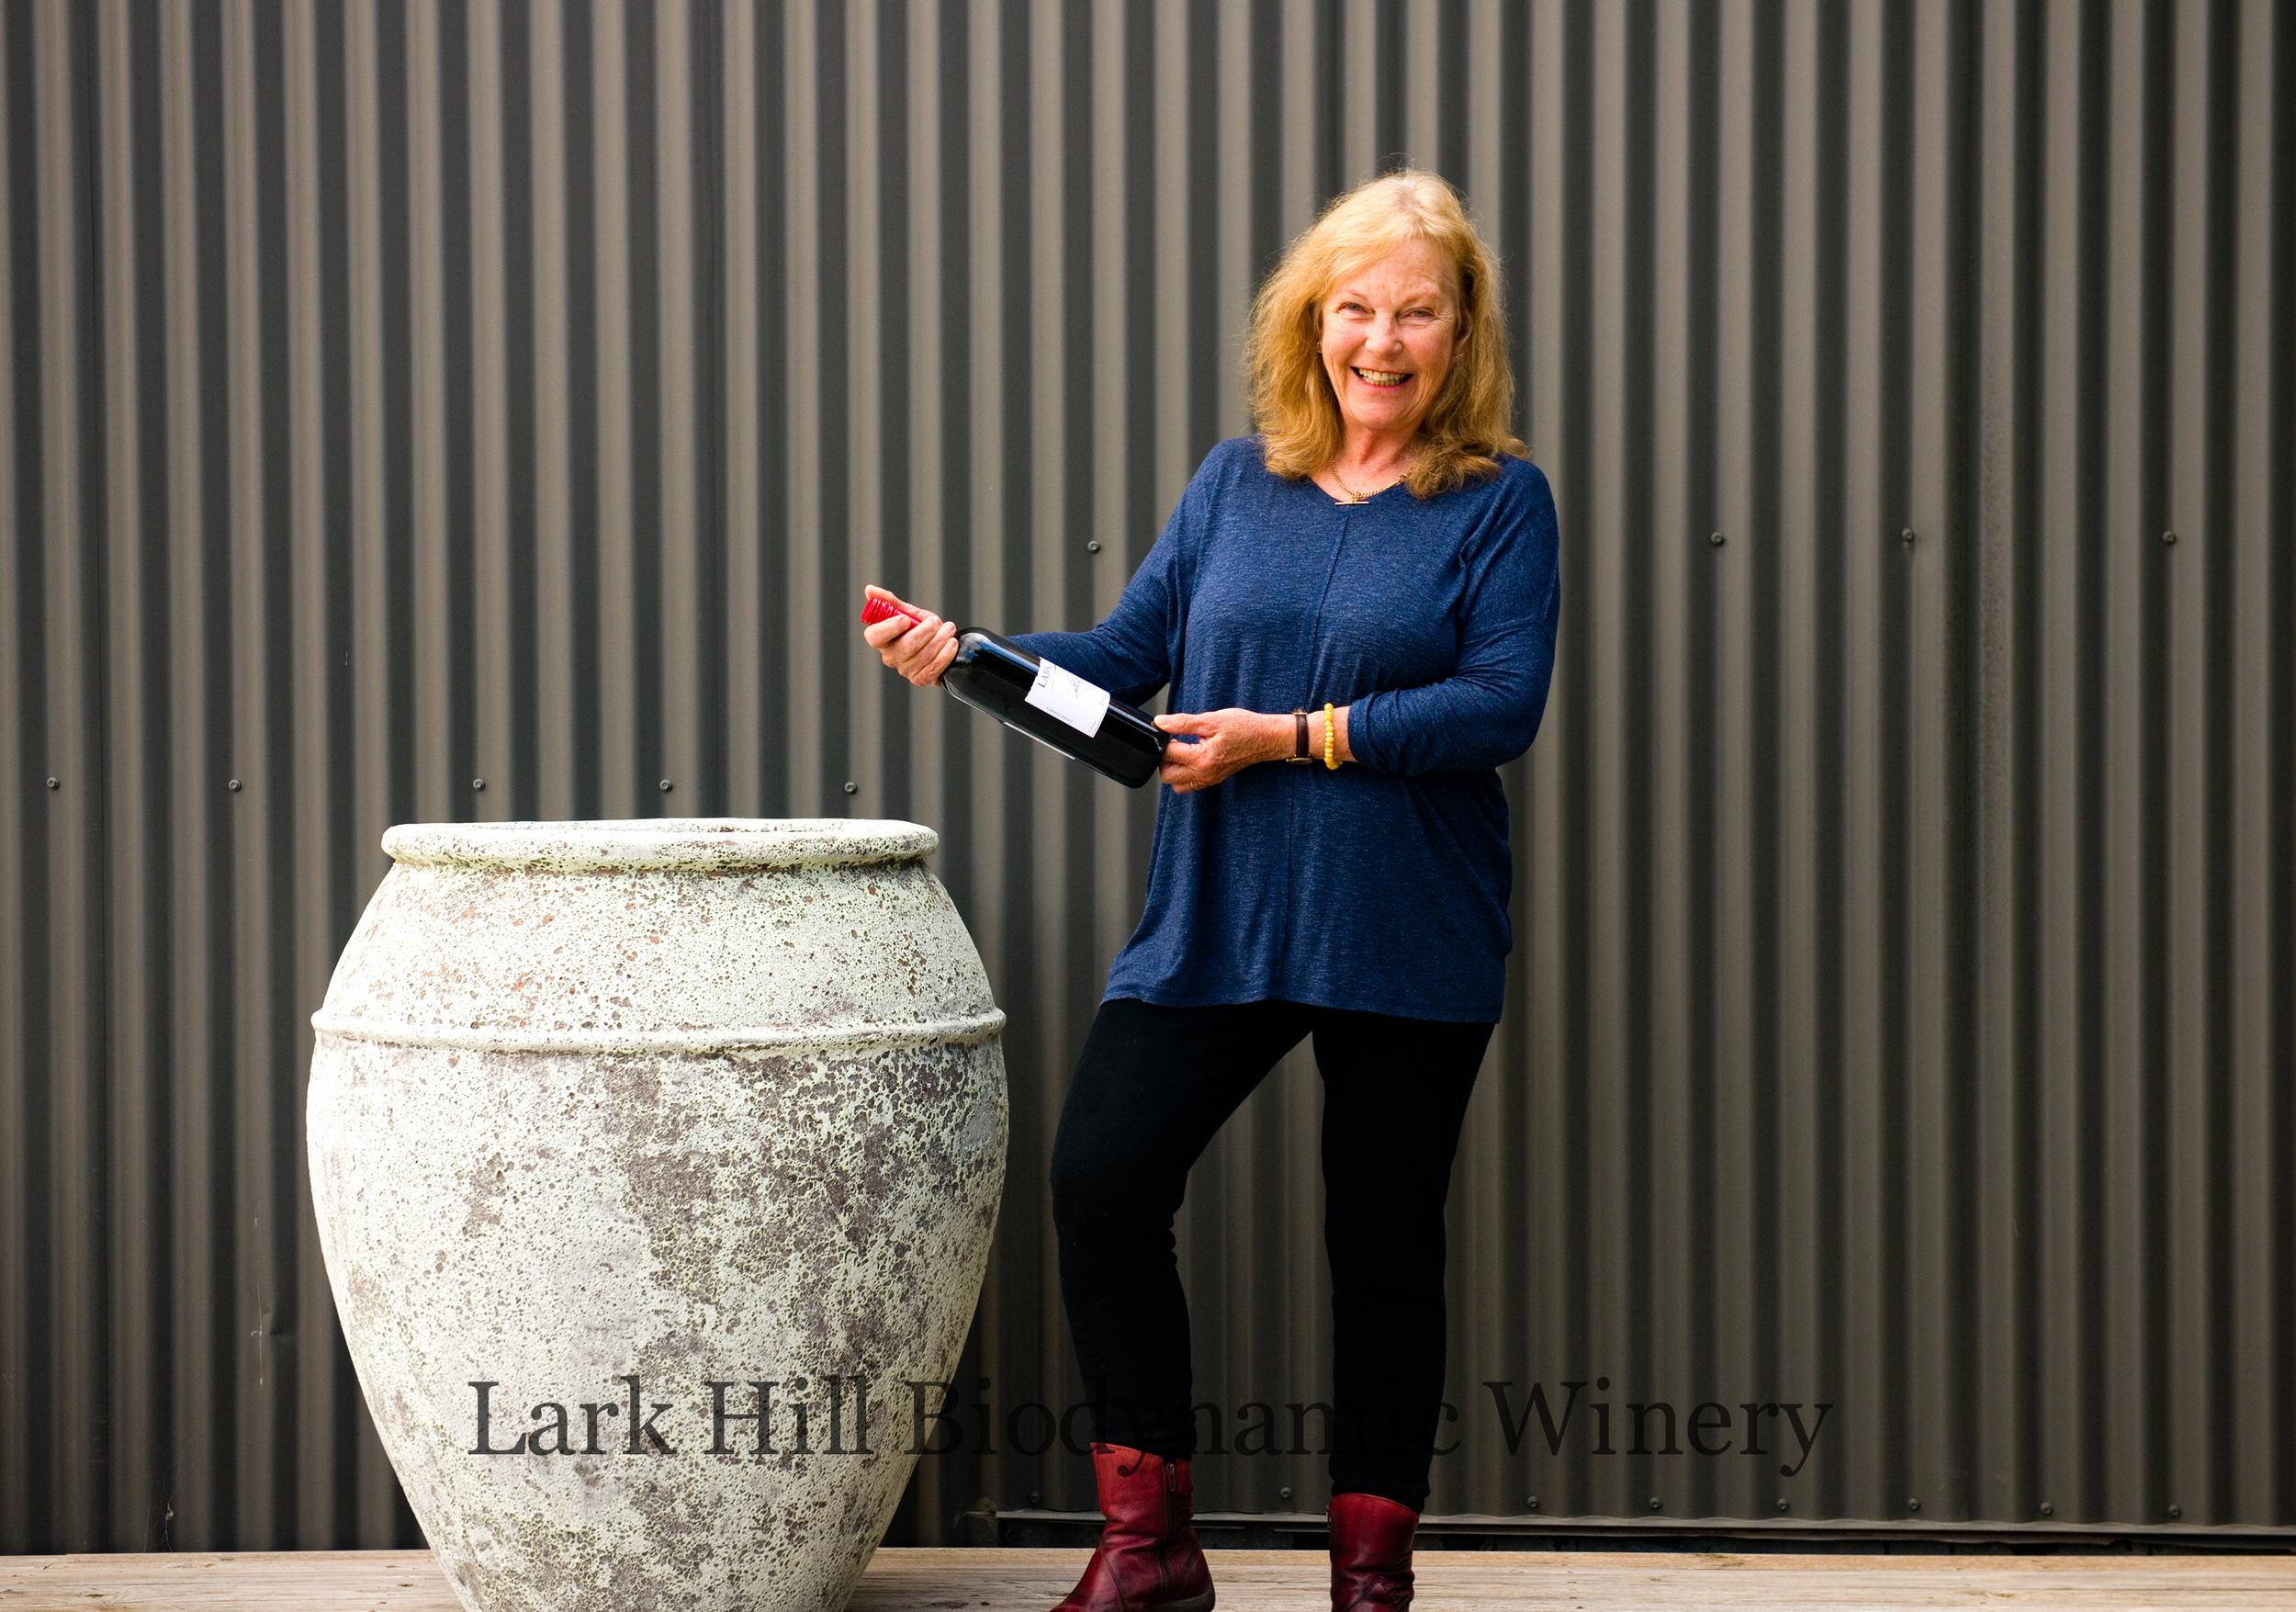 Lark-Hill-Winery-4.jpg